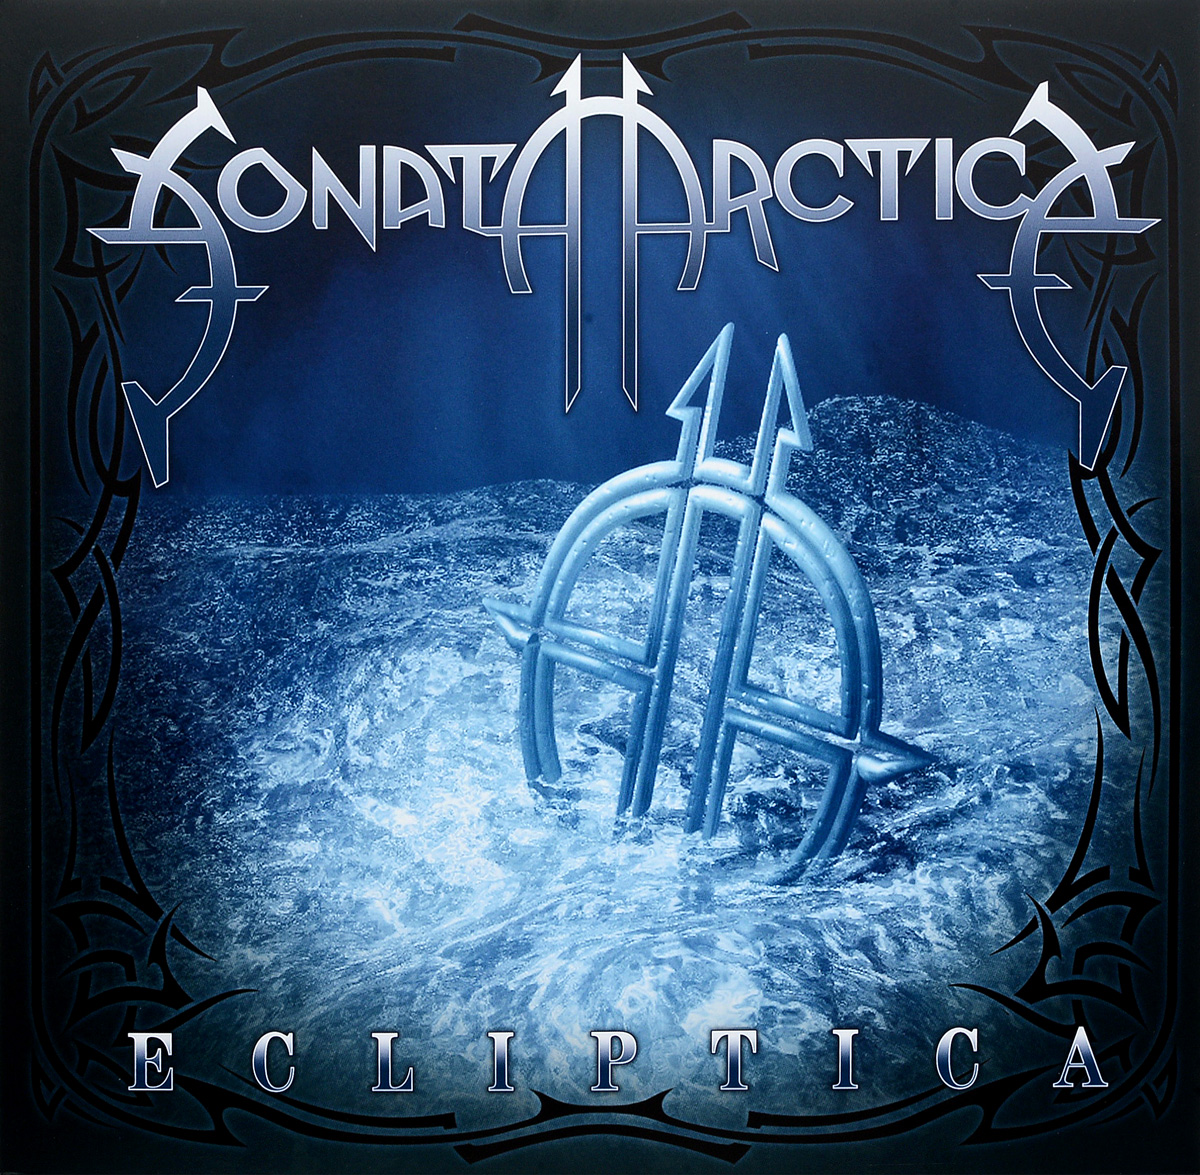 Sonata Arctica Sonata Arctica. Ecliptica (2 LP) велосипед kross trans arctica lady 2016